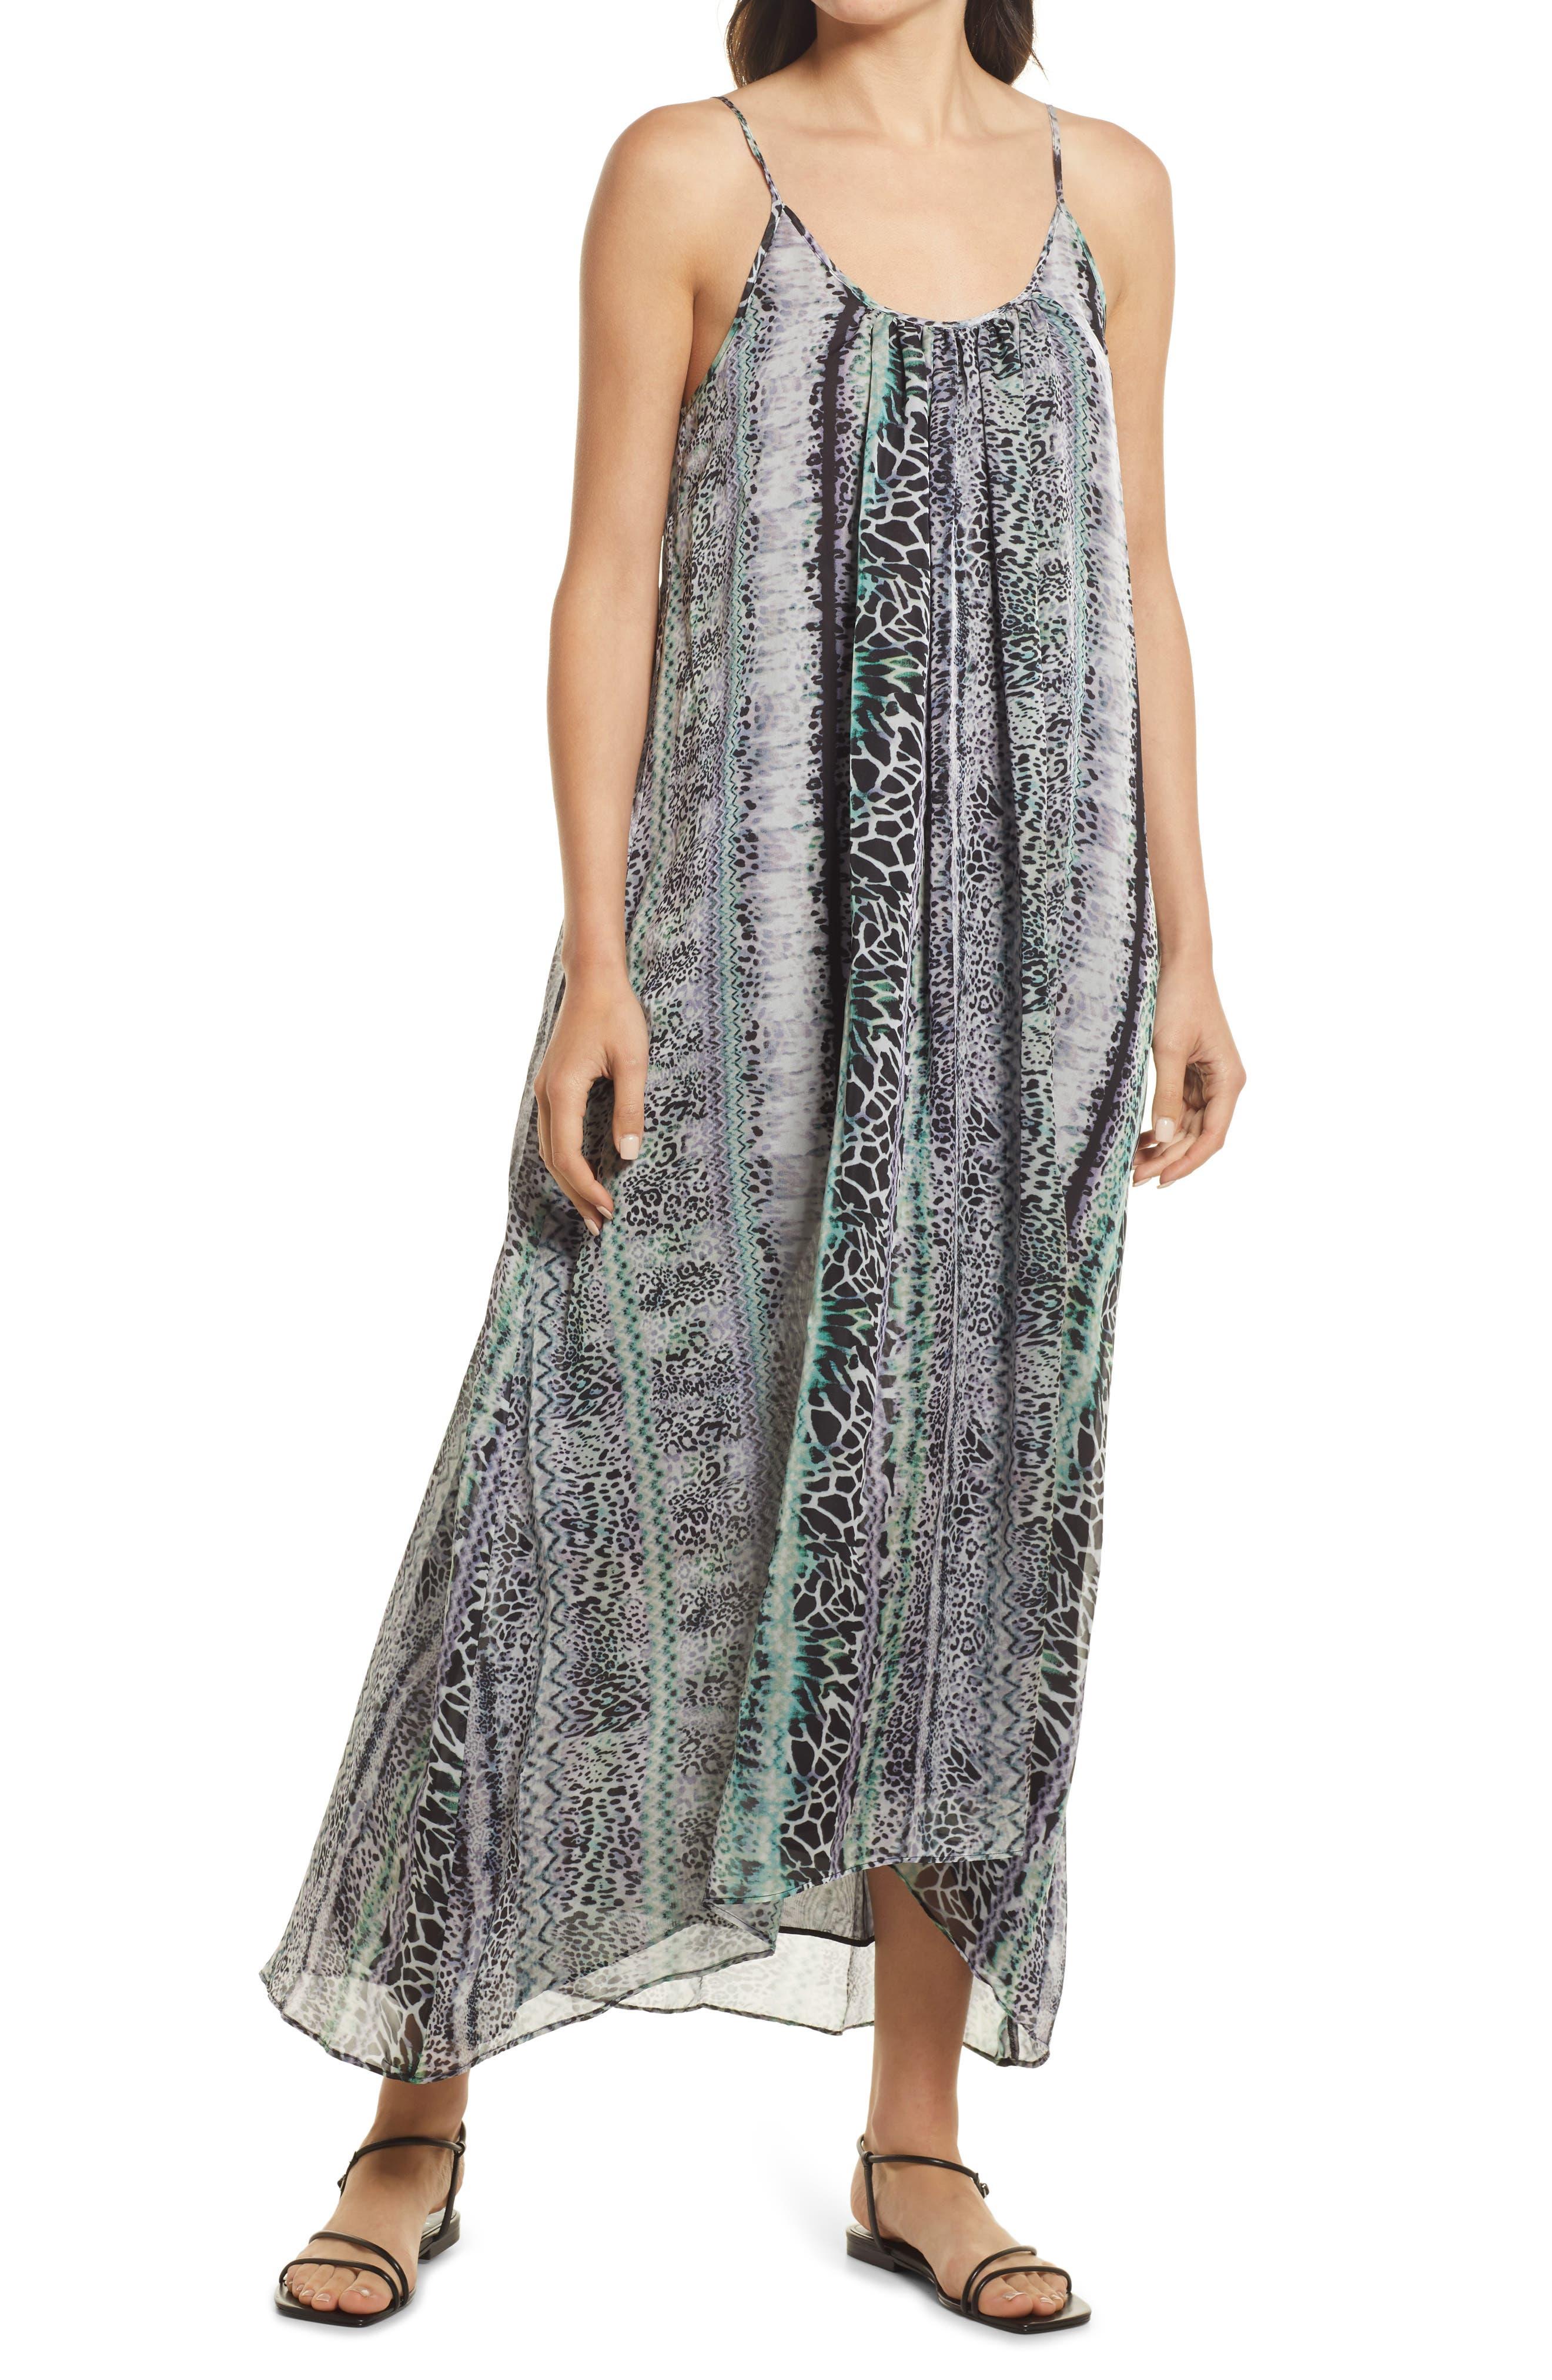 Animal Print Double Scoop Chiffon Maxi Dress